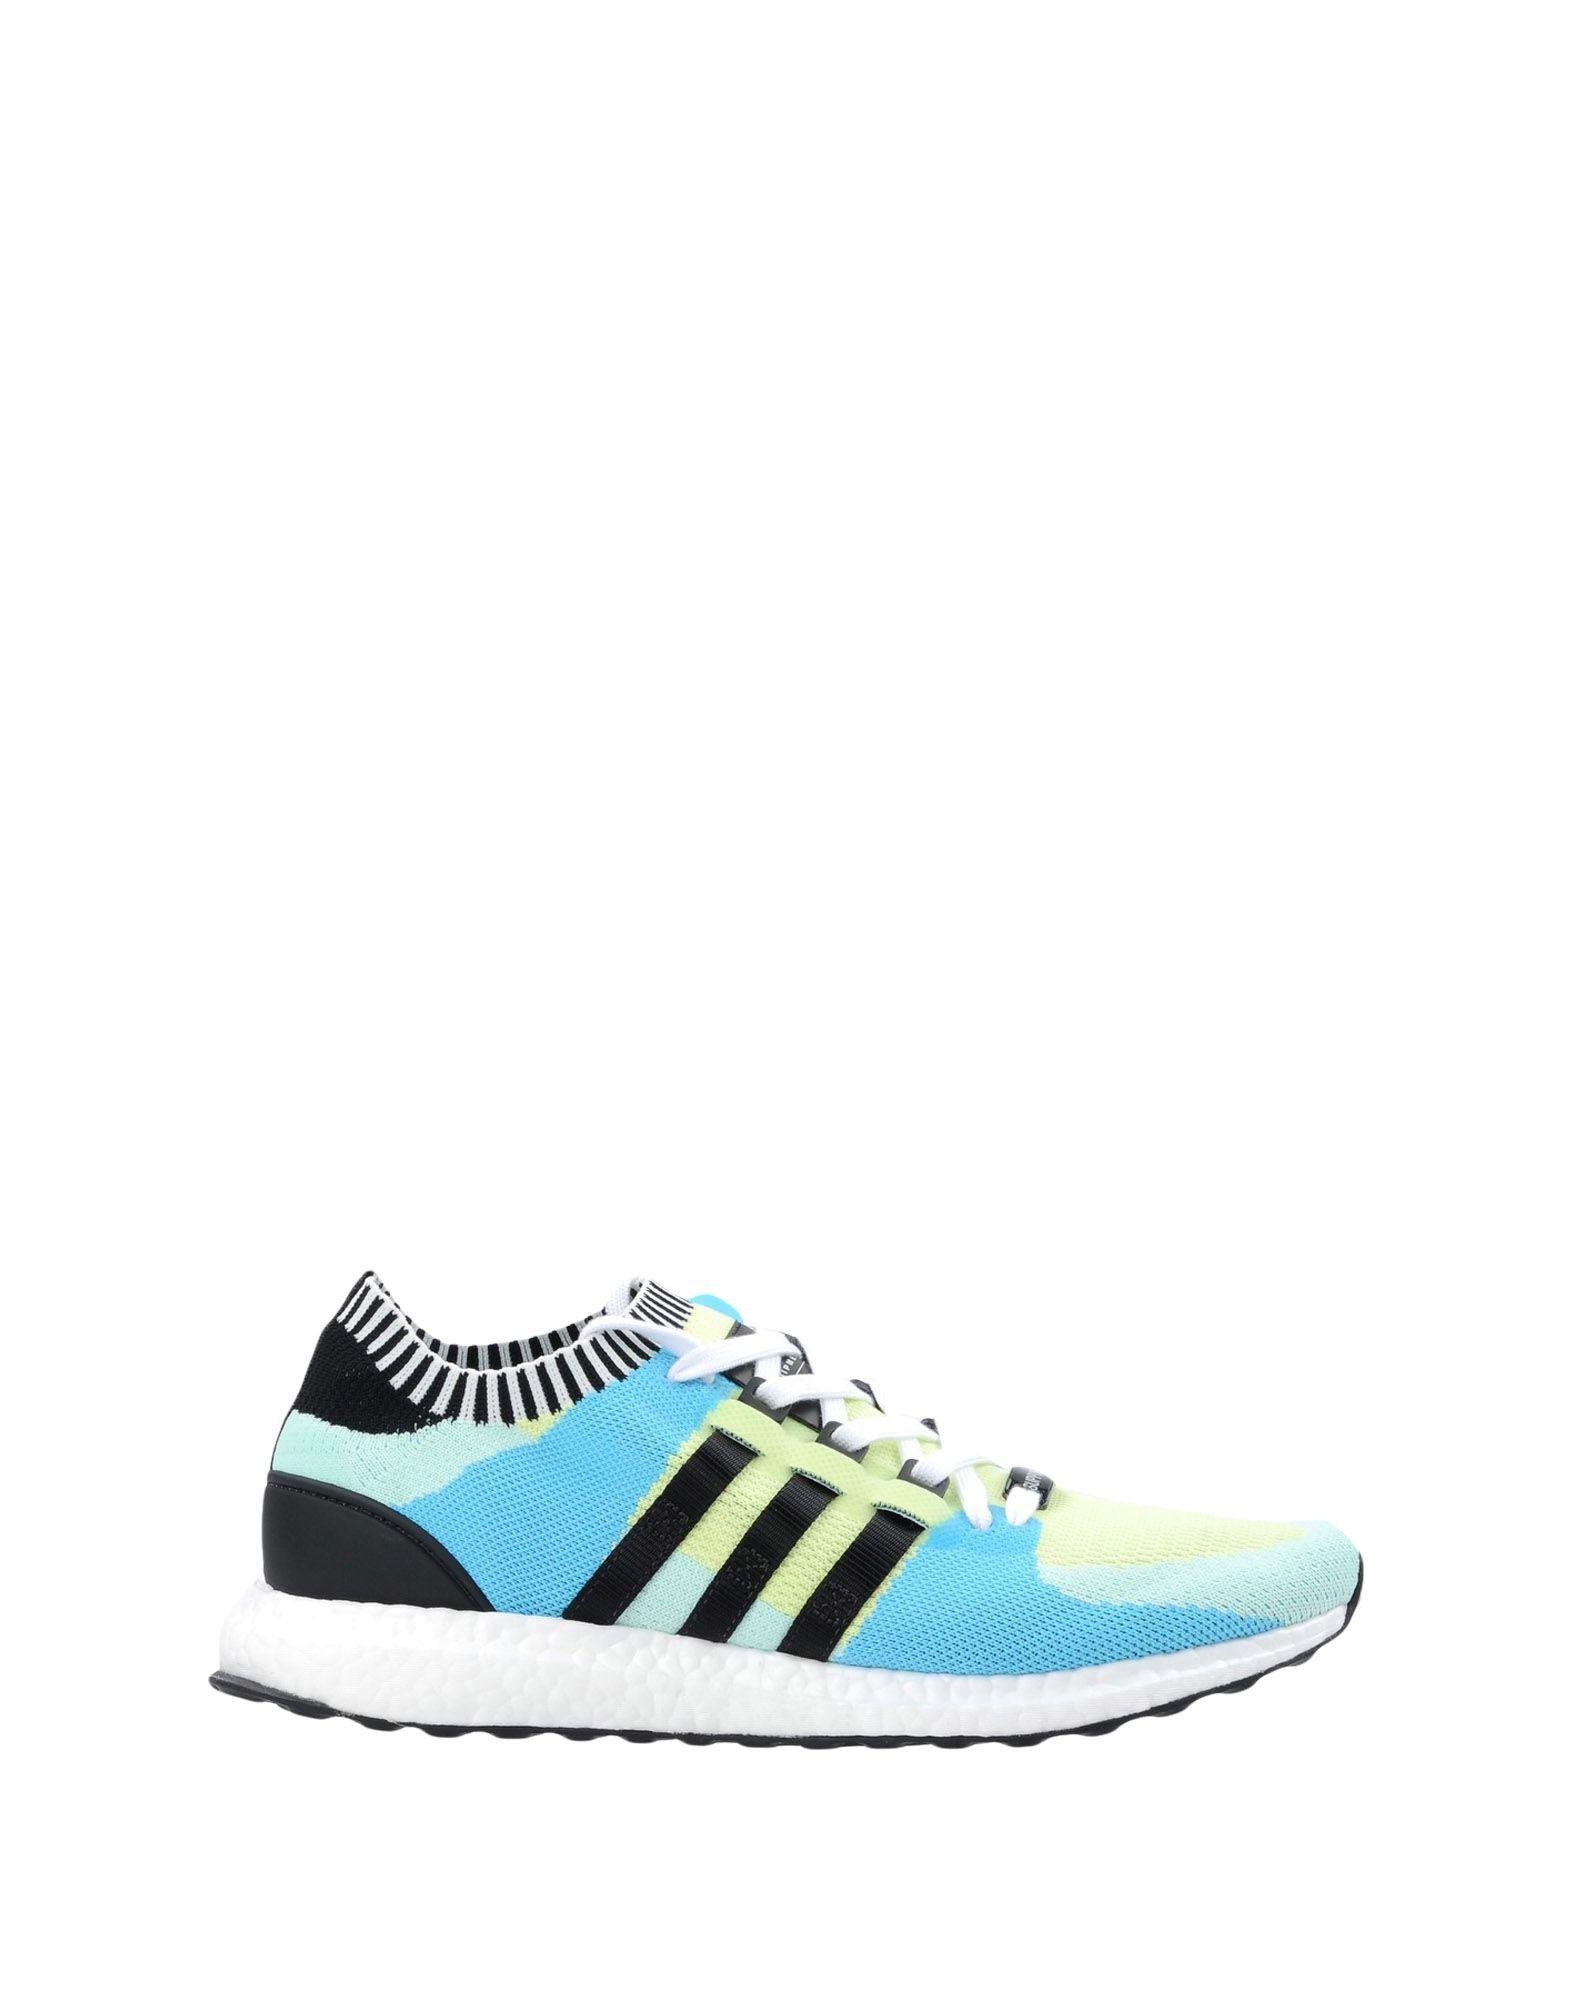 Rabatt echte Schuhe Adidas Originals Eqt Support Ultra P  11272276XB